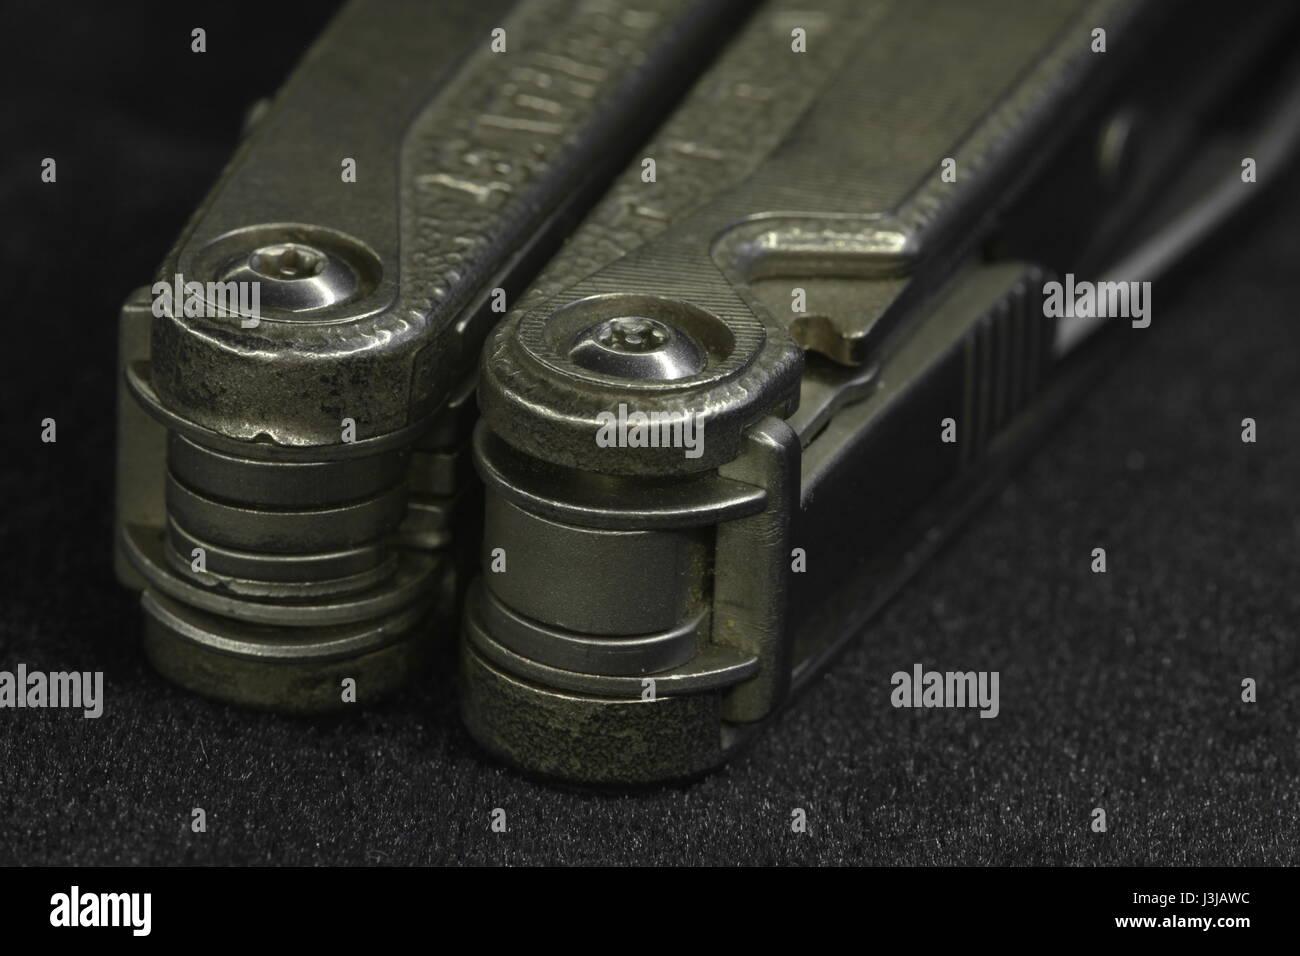 multitool Steel knife macro shot - Stock Image